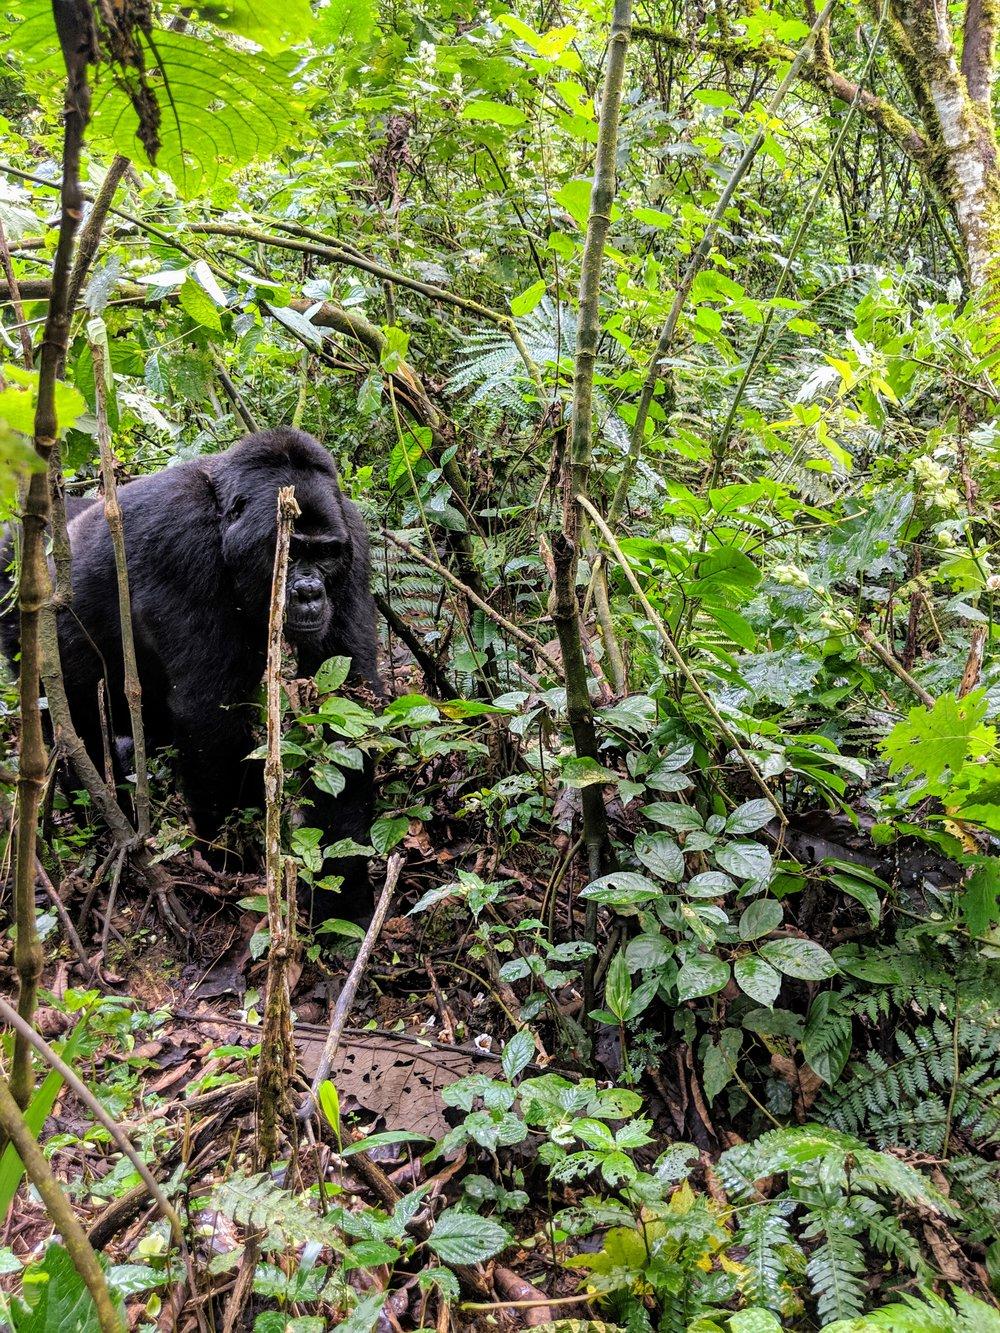 A silverback mountain gorilla in Bwindi Impenetrable National Park. Photographer: Elisabeth Engl